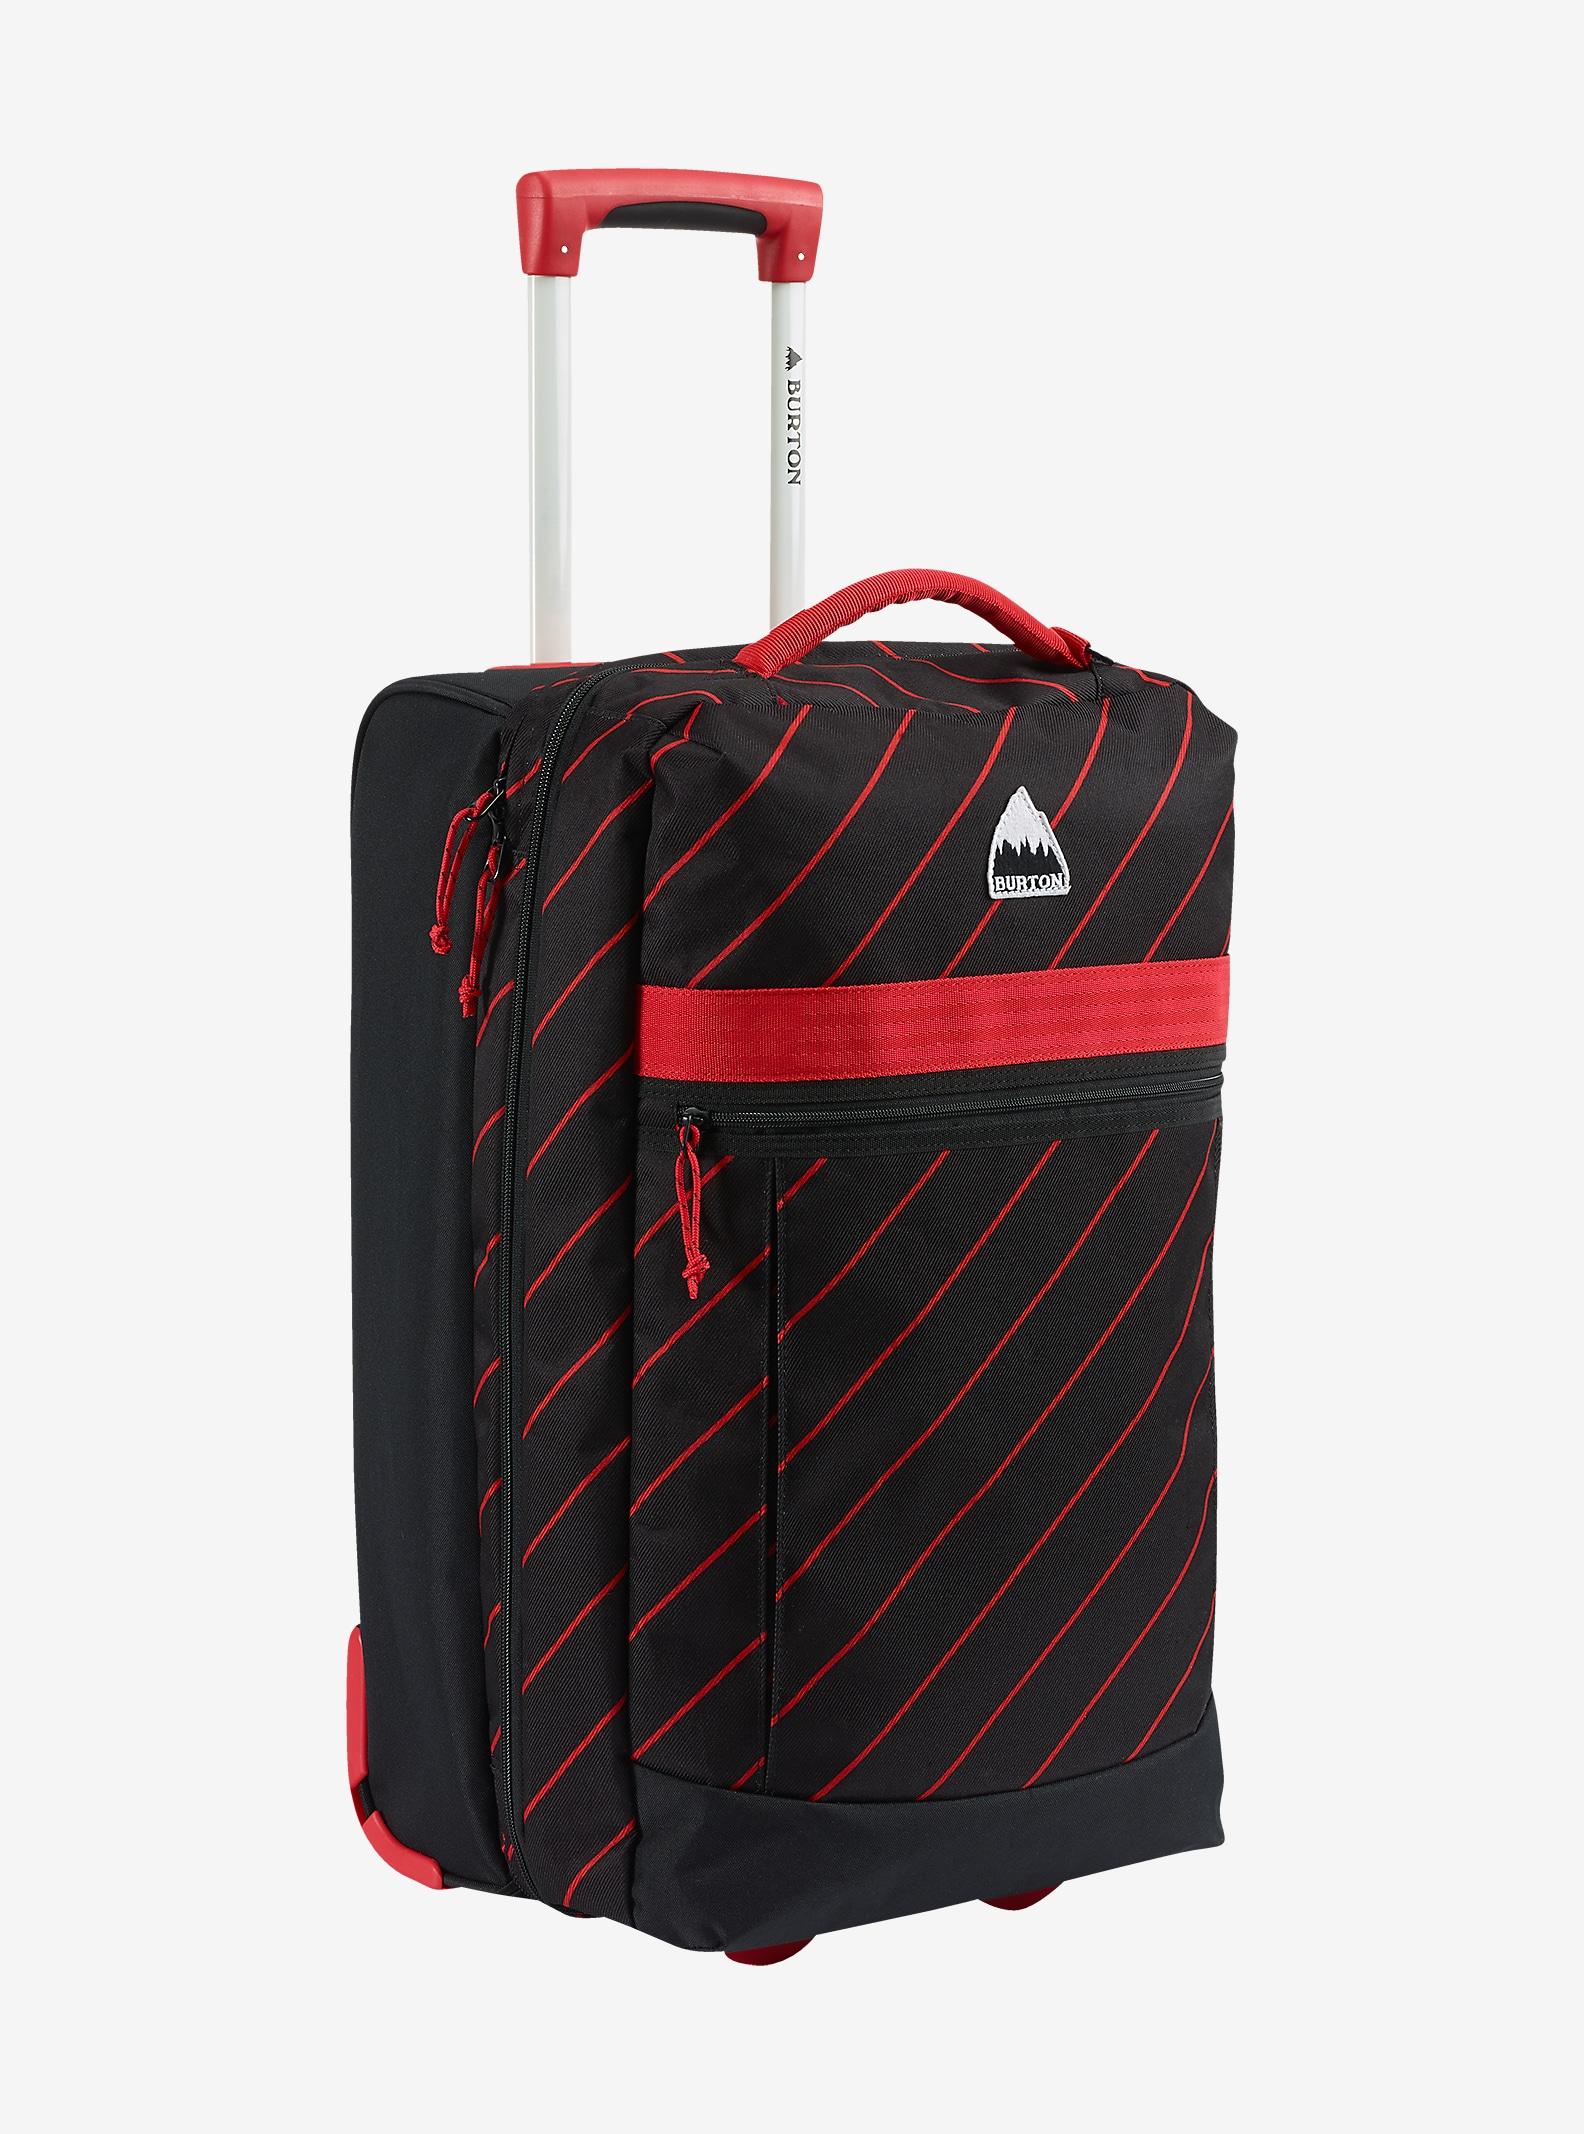 Burton Charter Roller Travel Bag shown in Performer